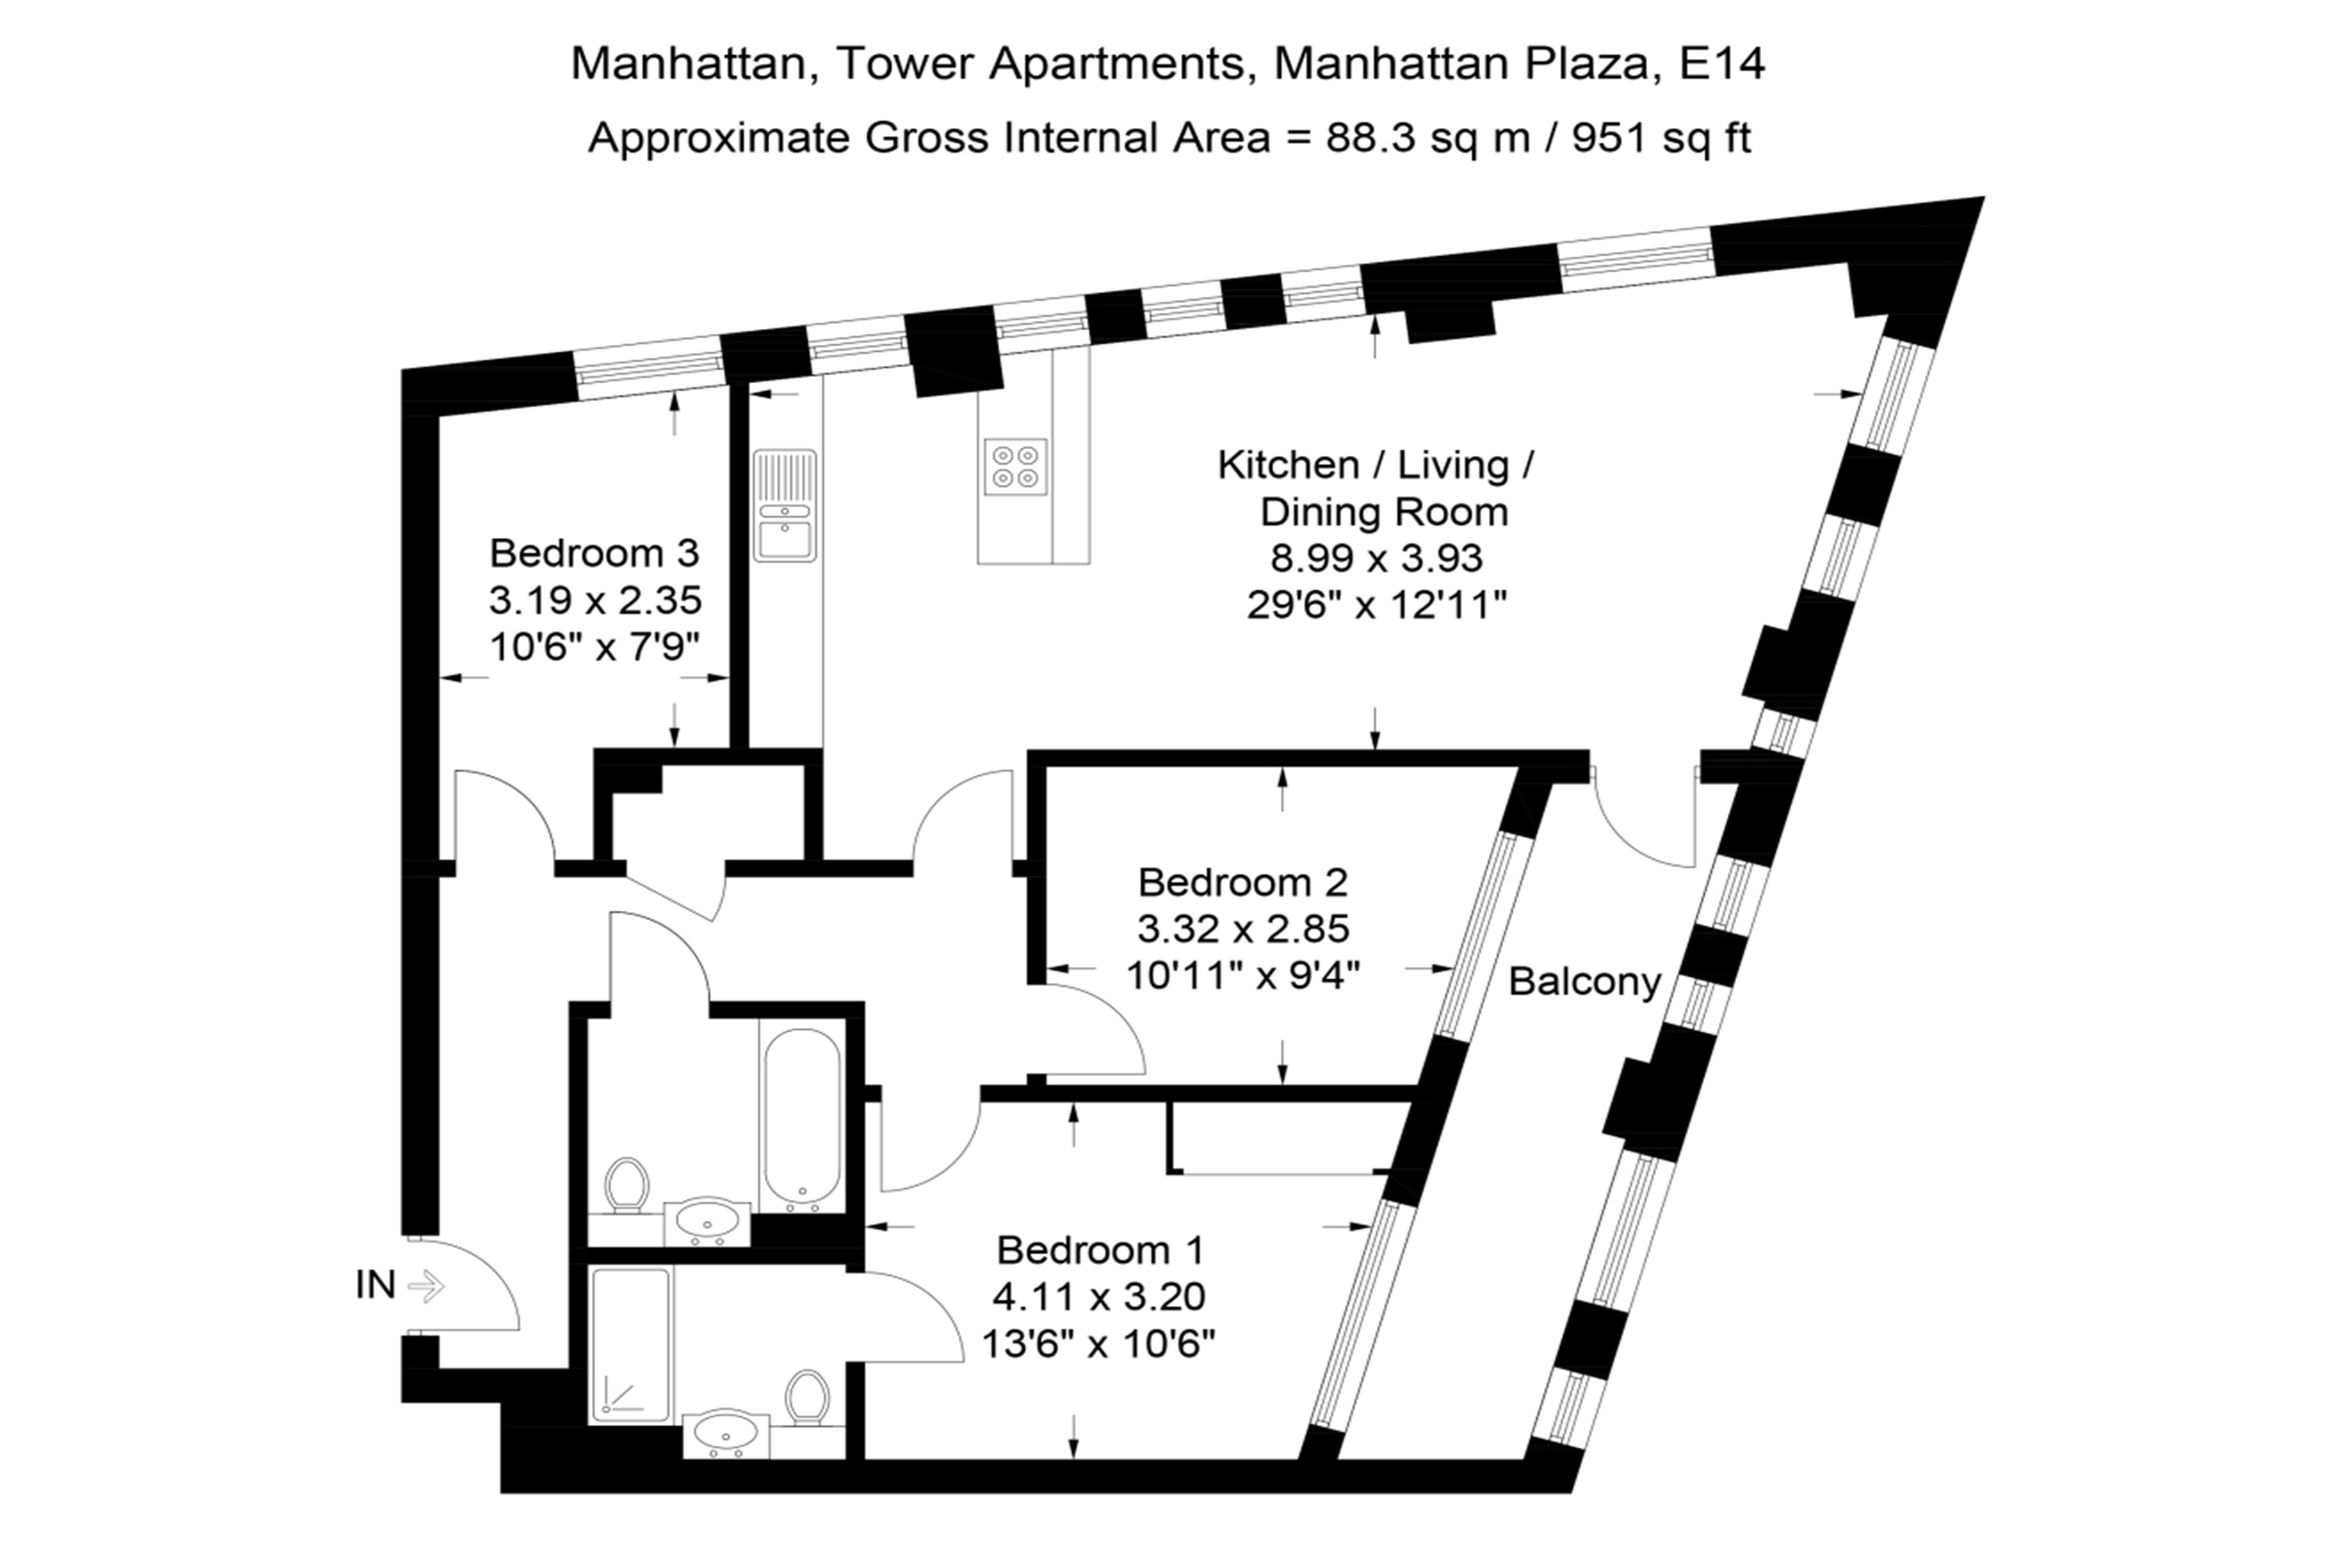 Manhattan Plaza Three Bedroom Artment Floor Plan